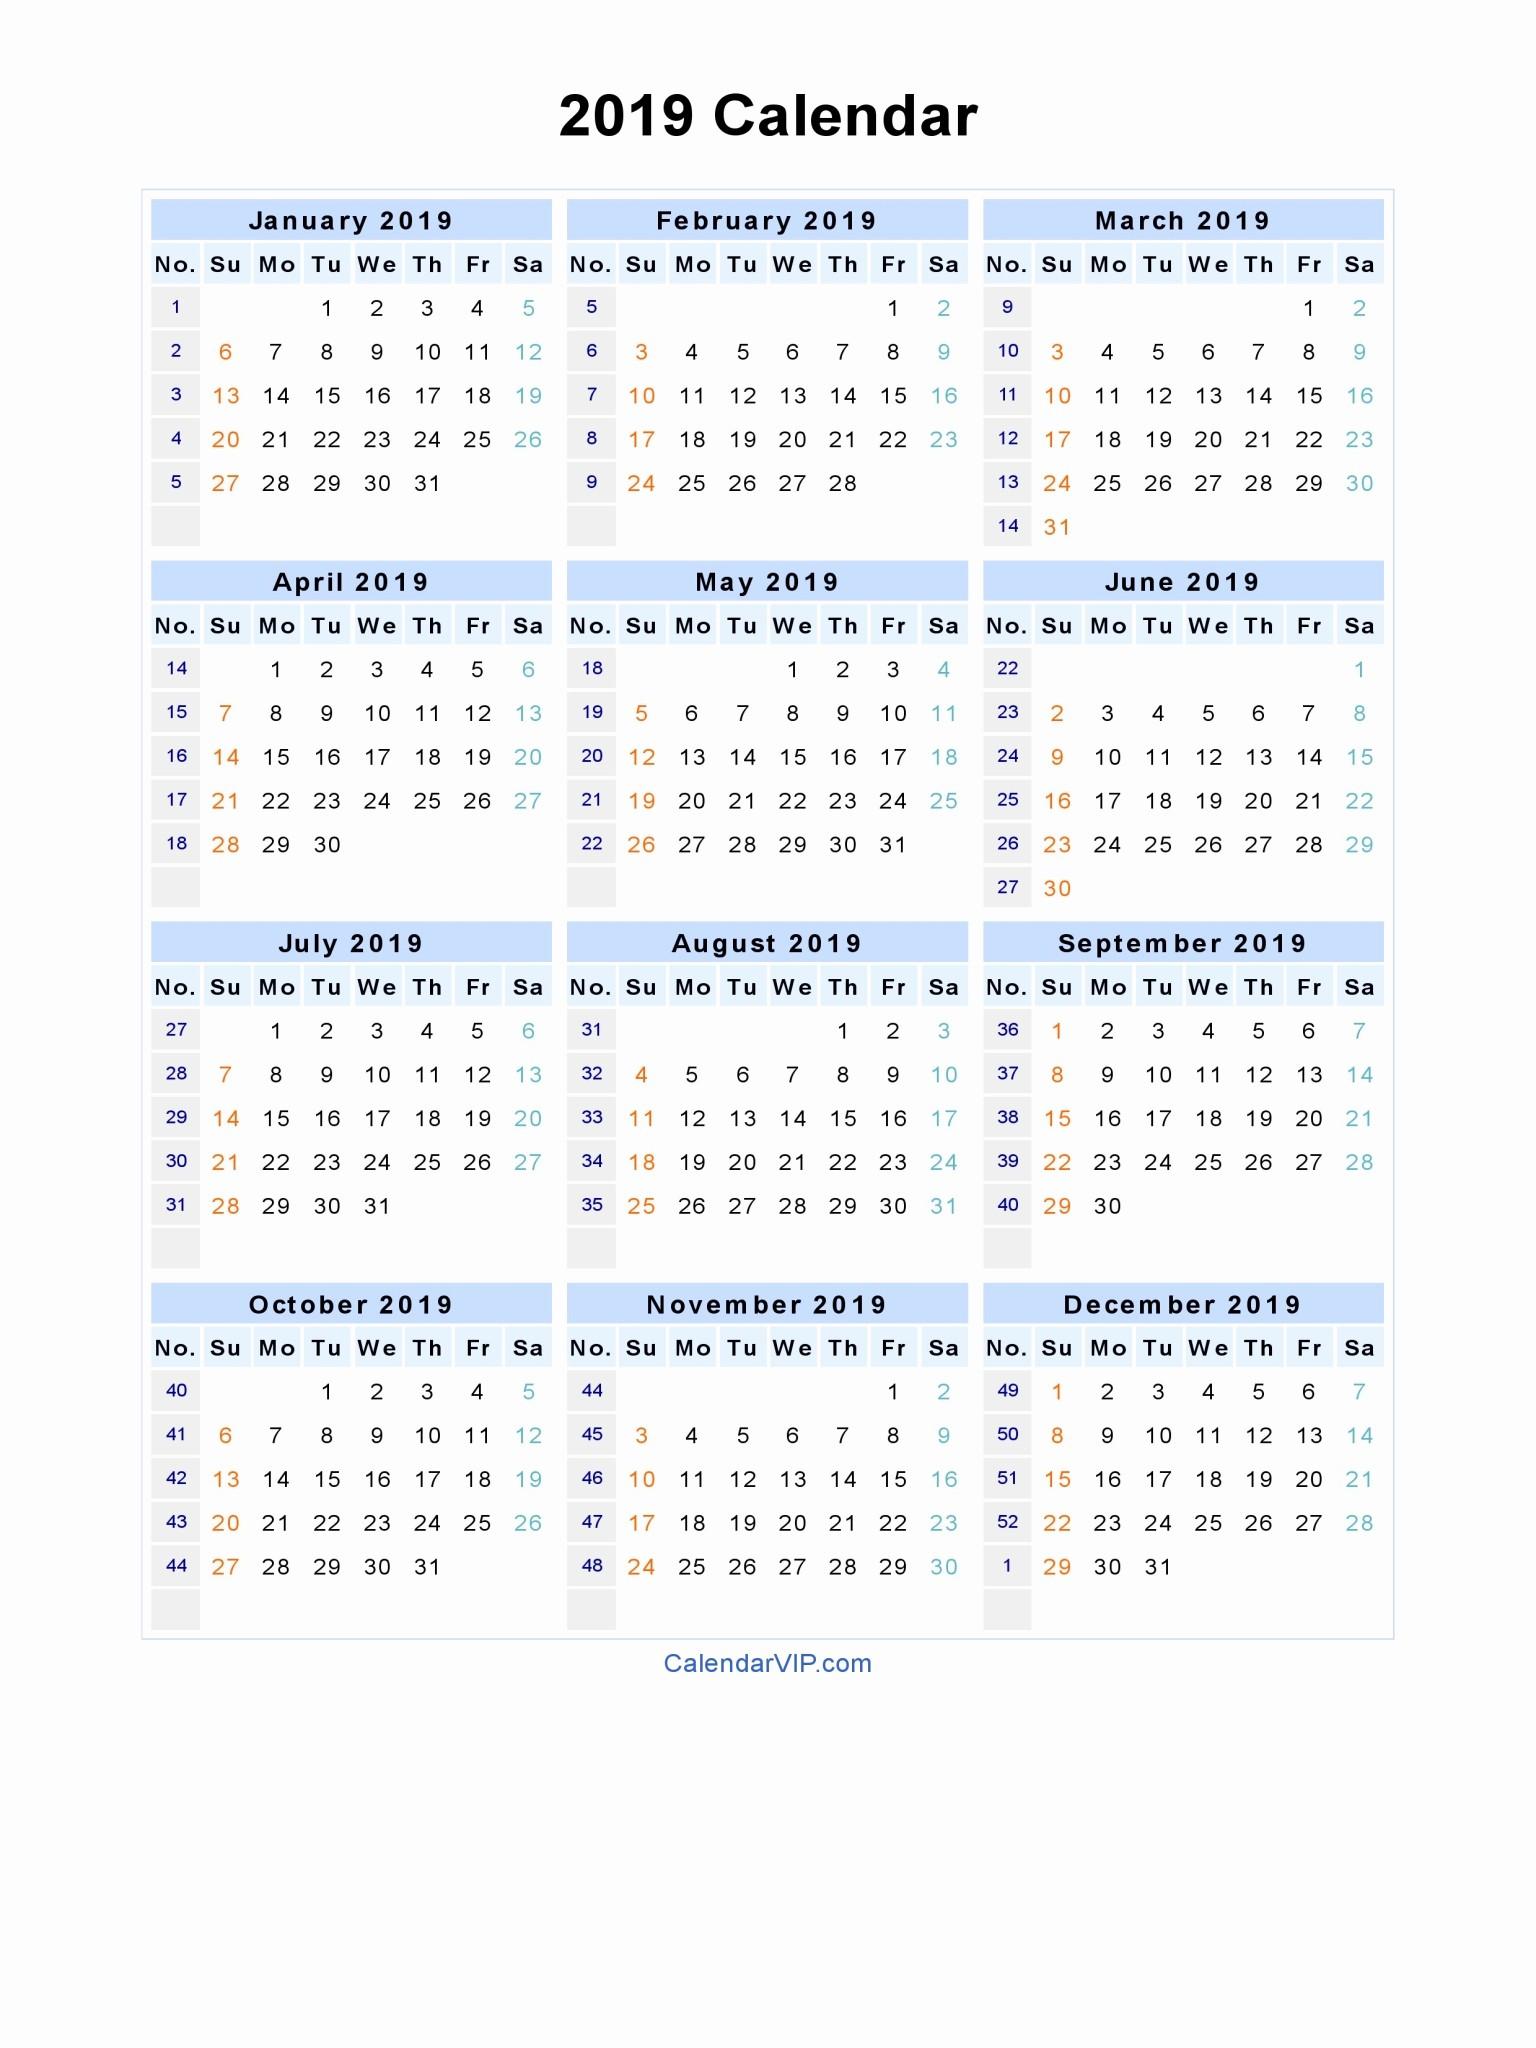 2019 Word Calendar with Holidays Awesome 2019 Calendar Word